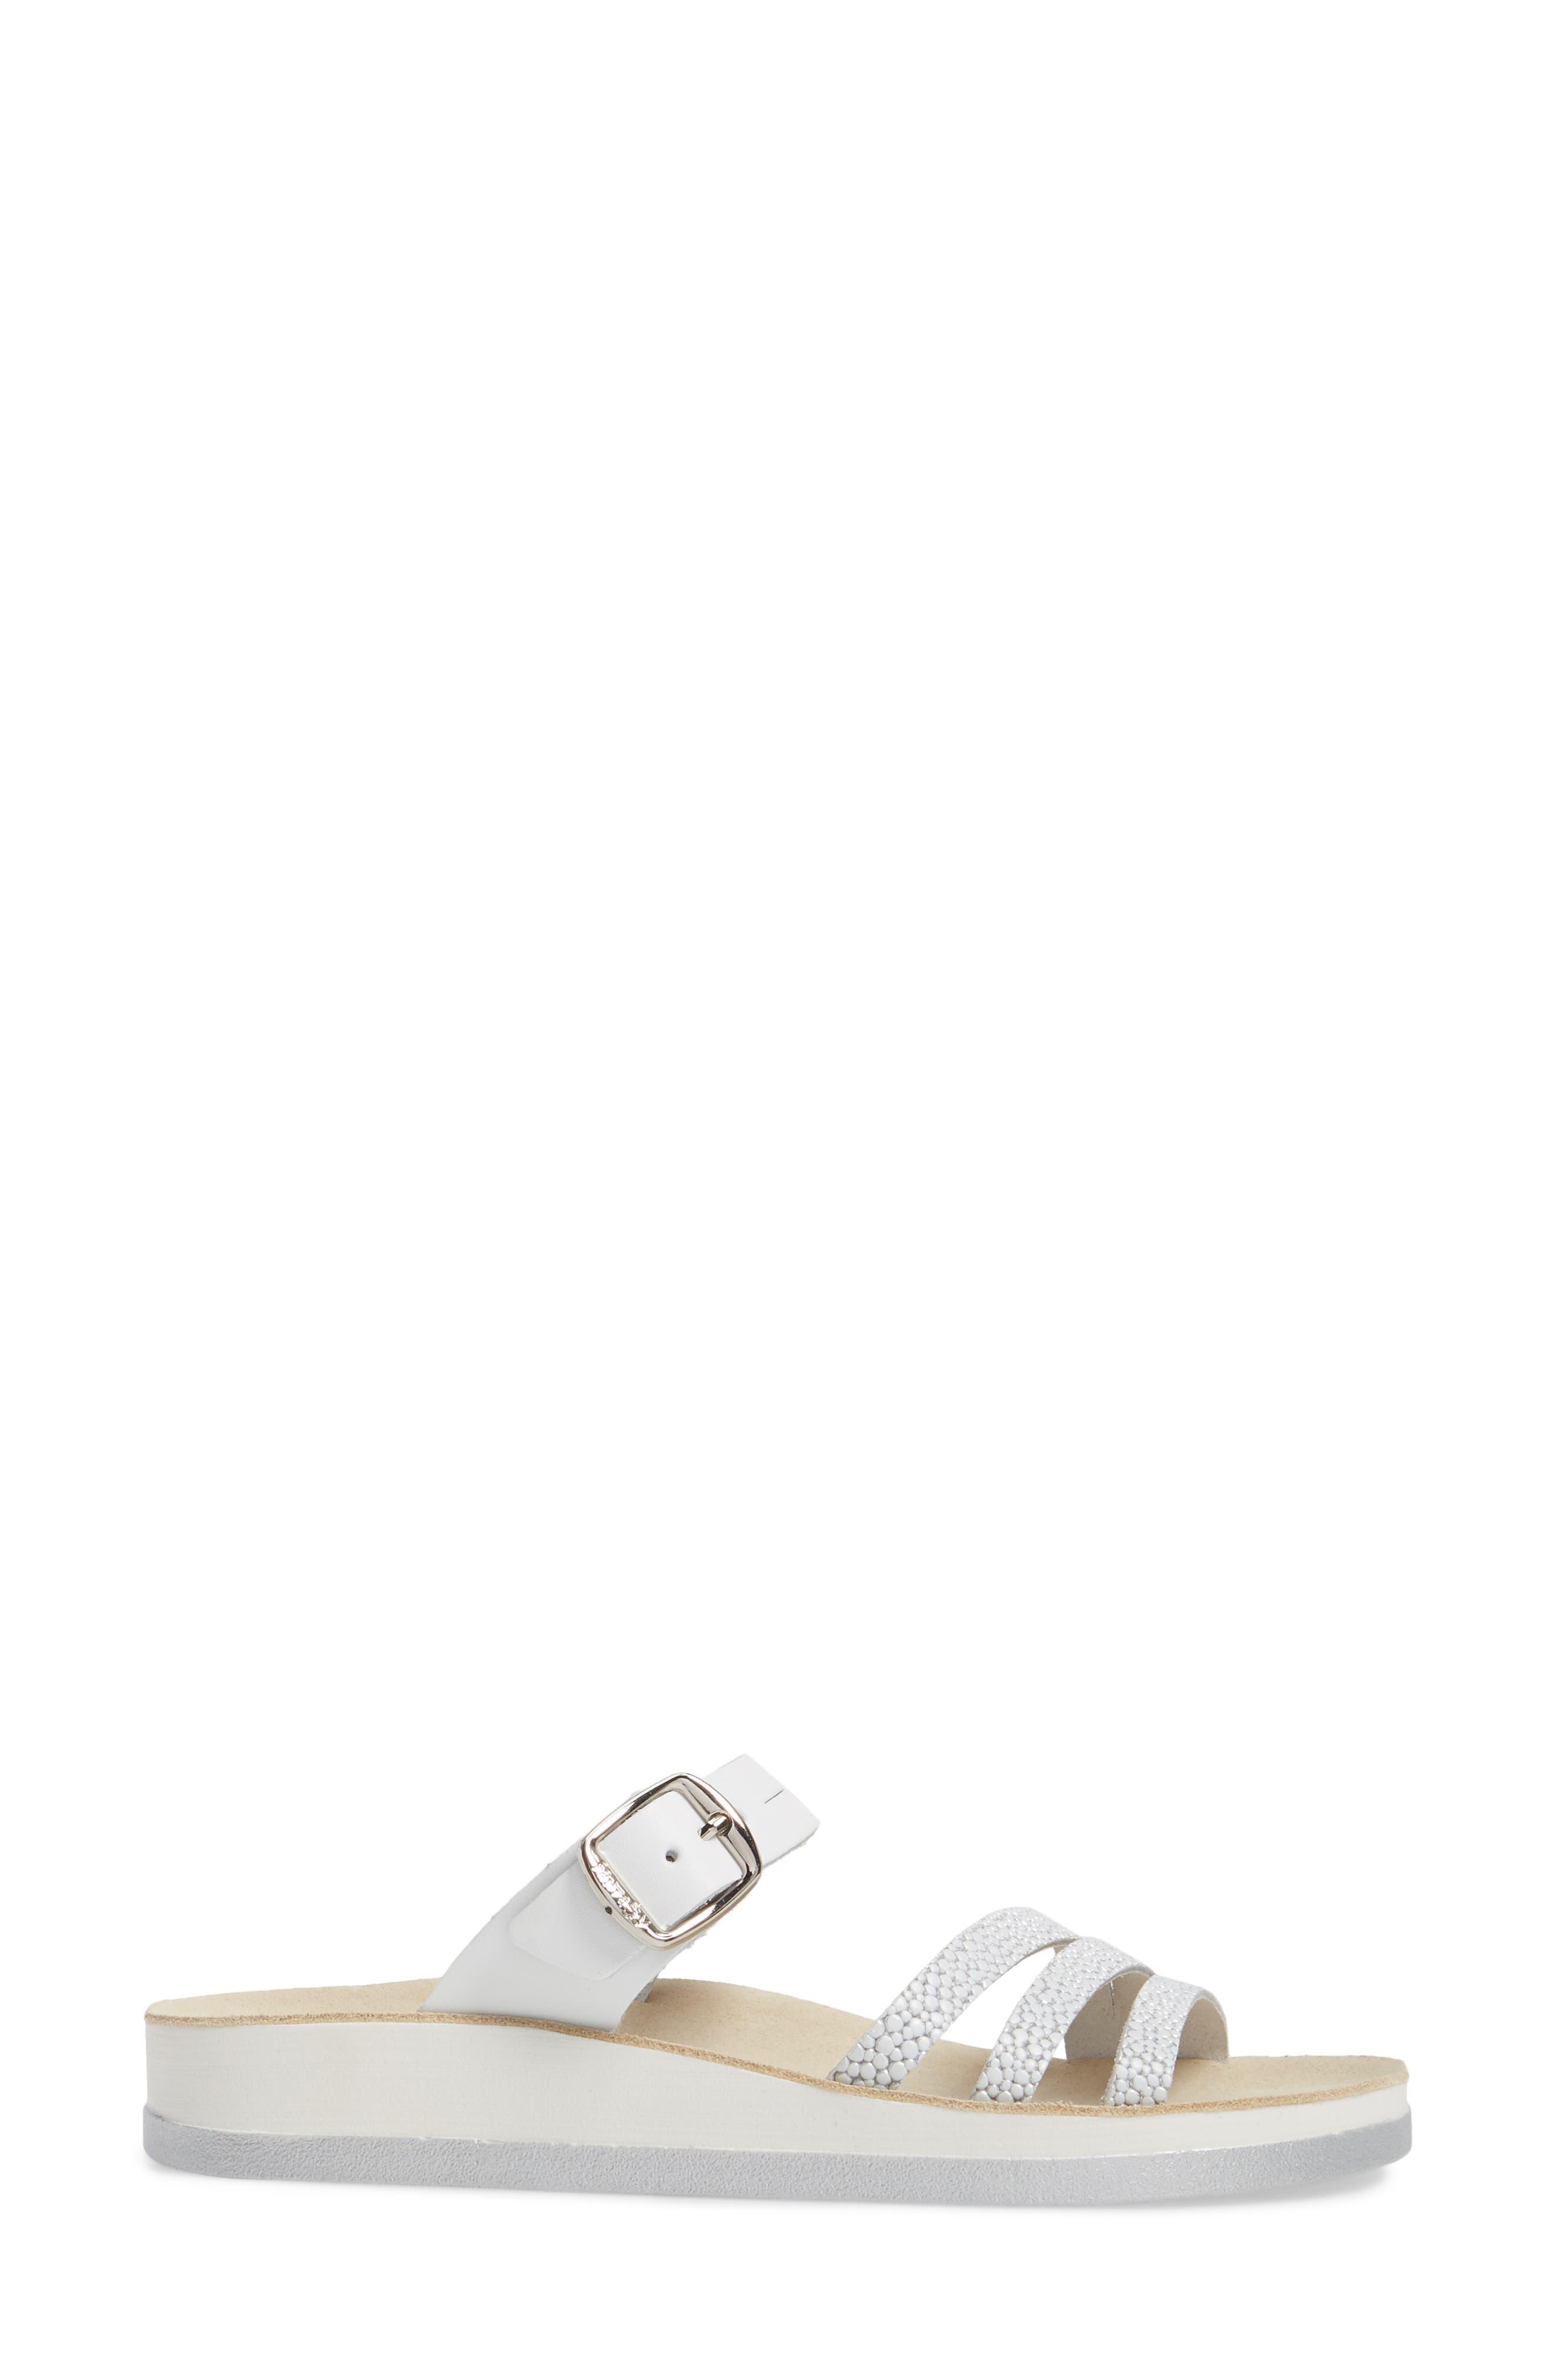 Lola Sandal,                             Alternate thumbnail 3, color,                             White/ Silver Leather